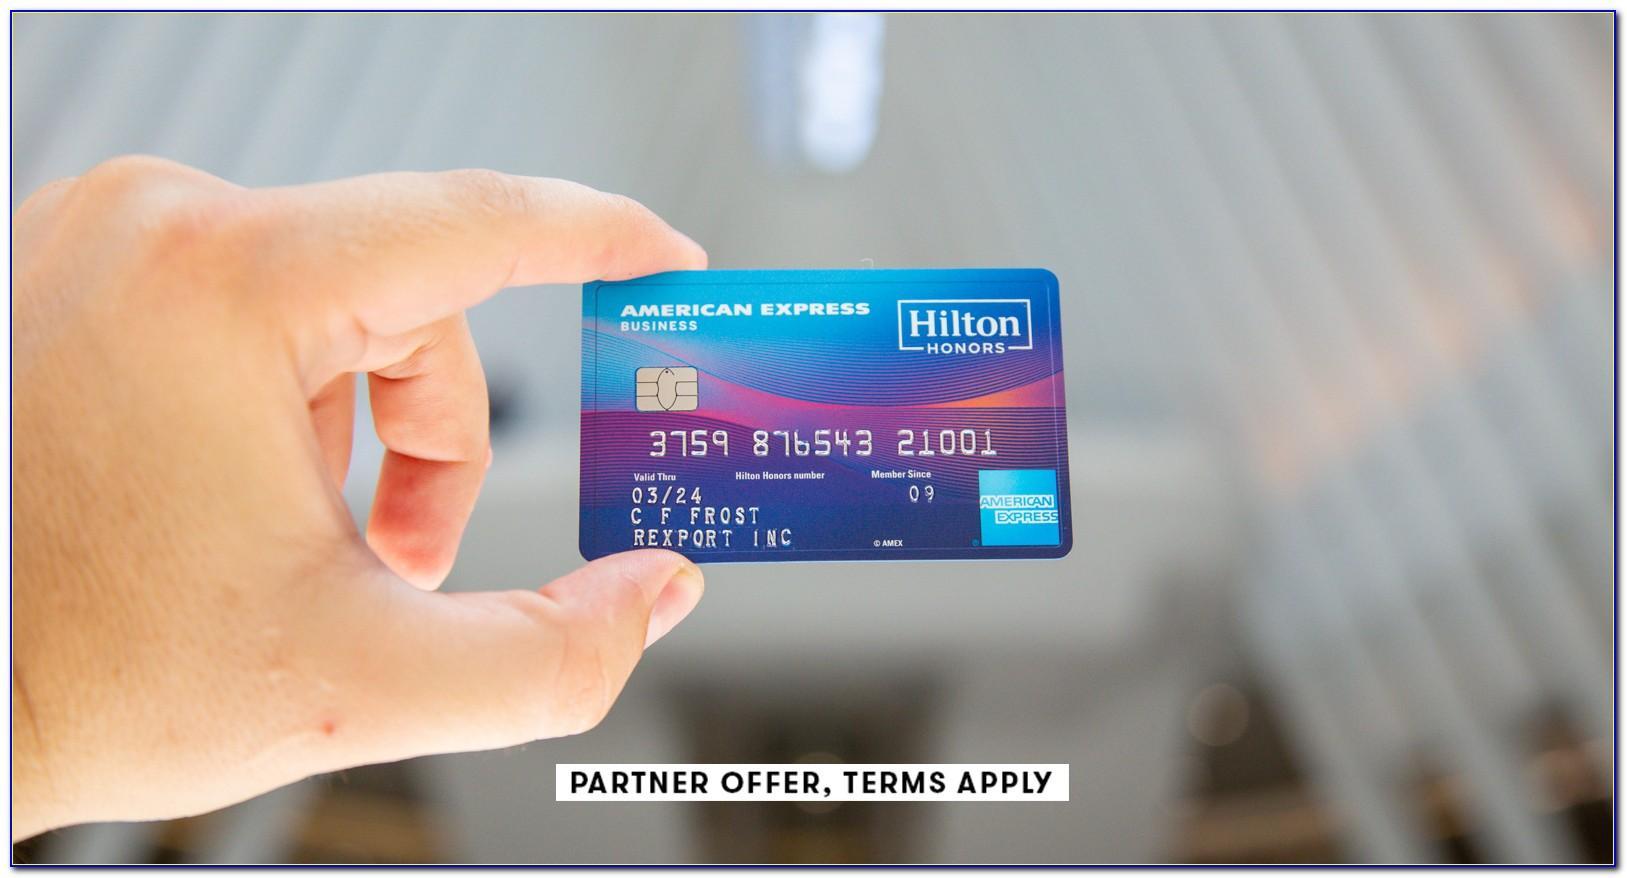 American Express Business Credit Card Rewards